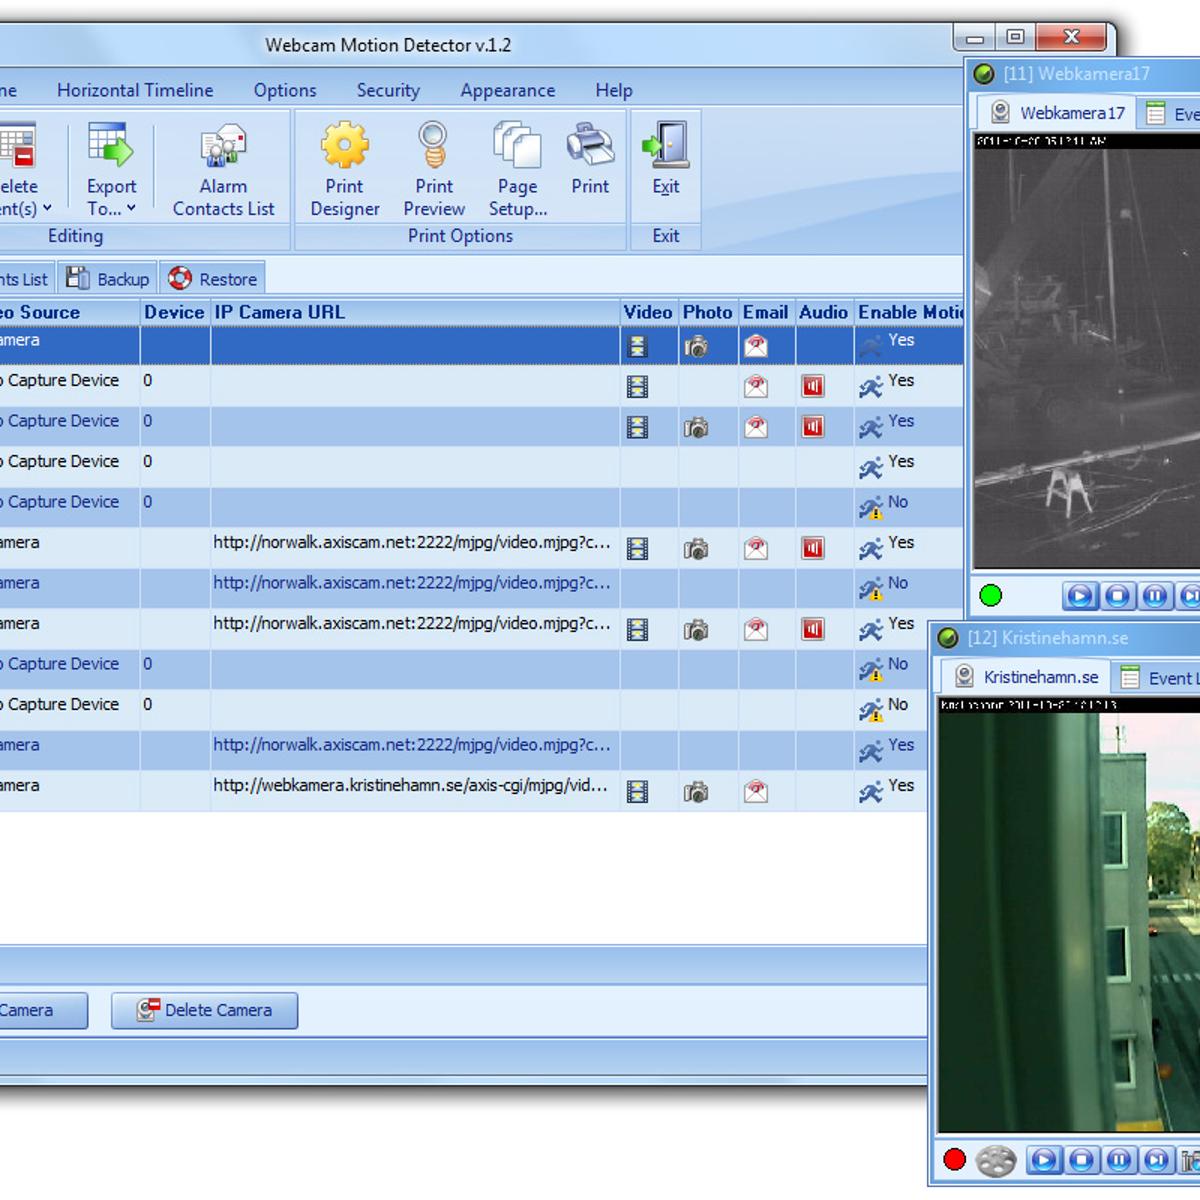 Webcam Motion Detector Alternatives and Similar Software